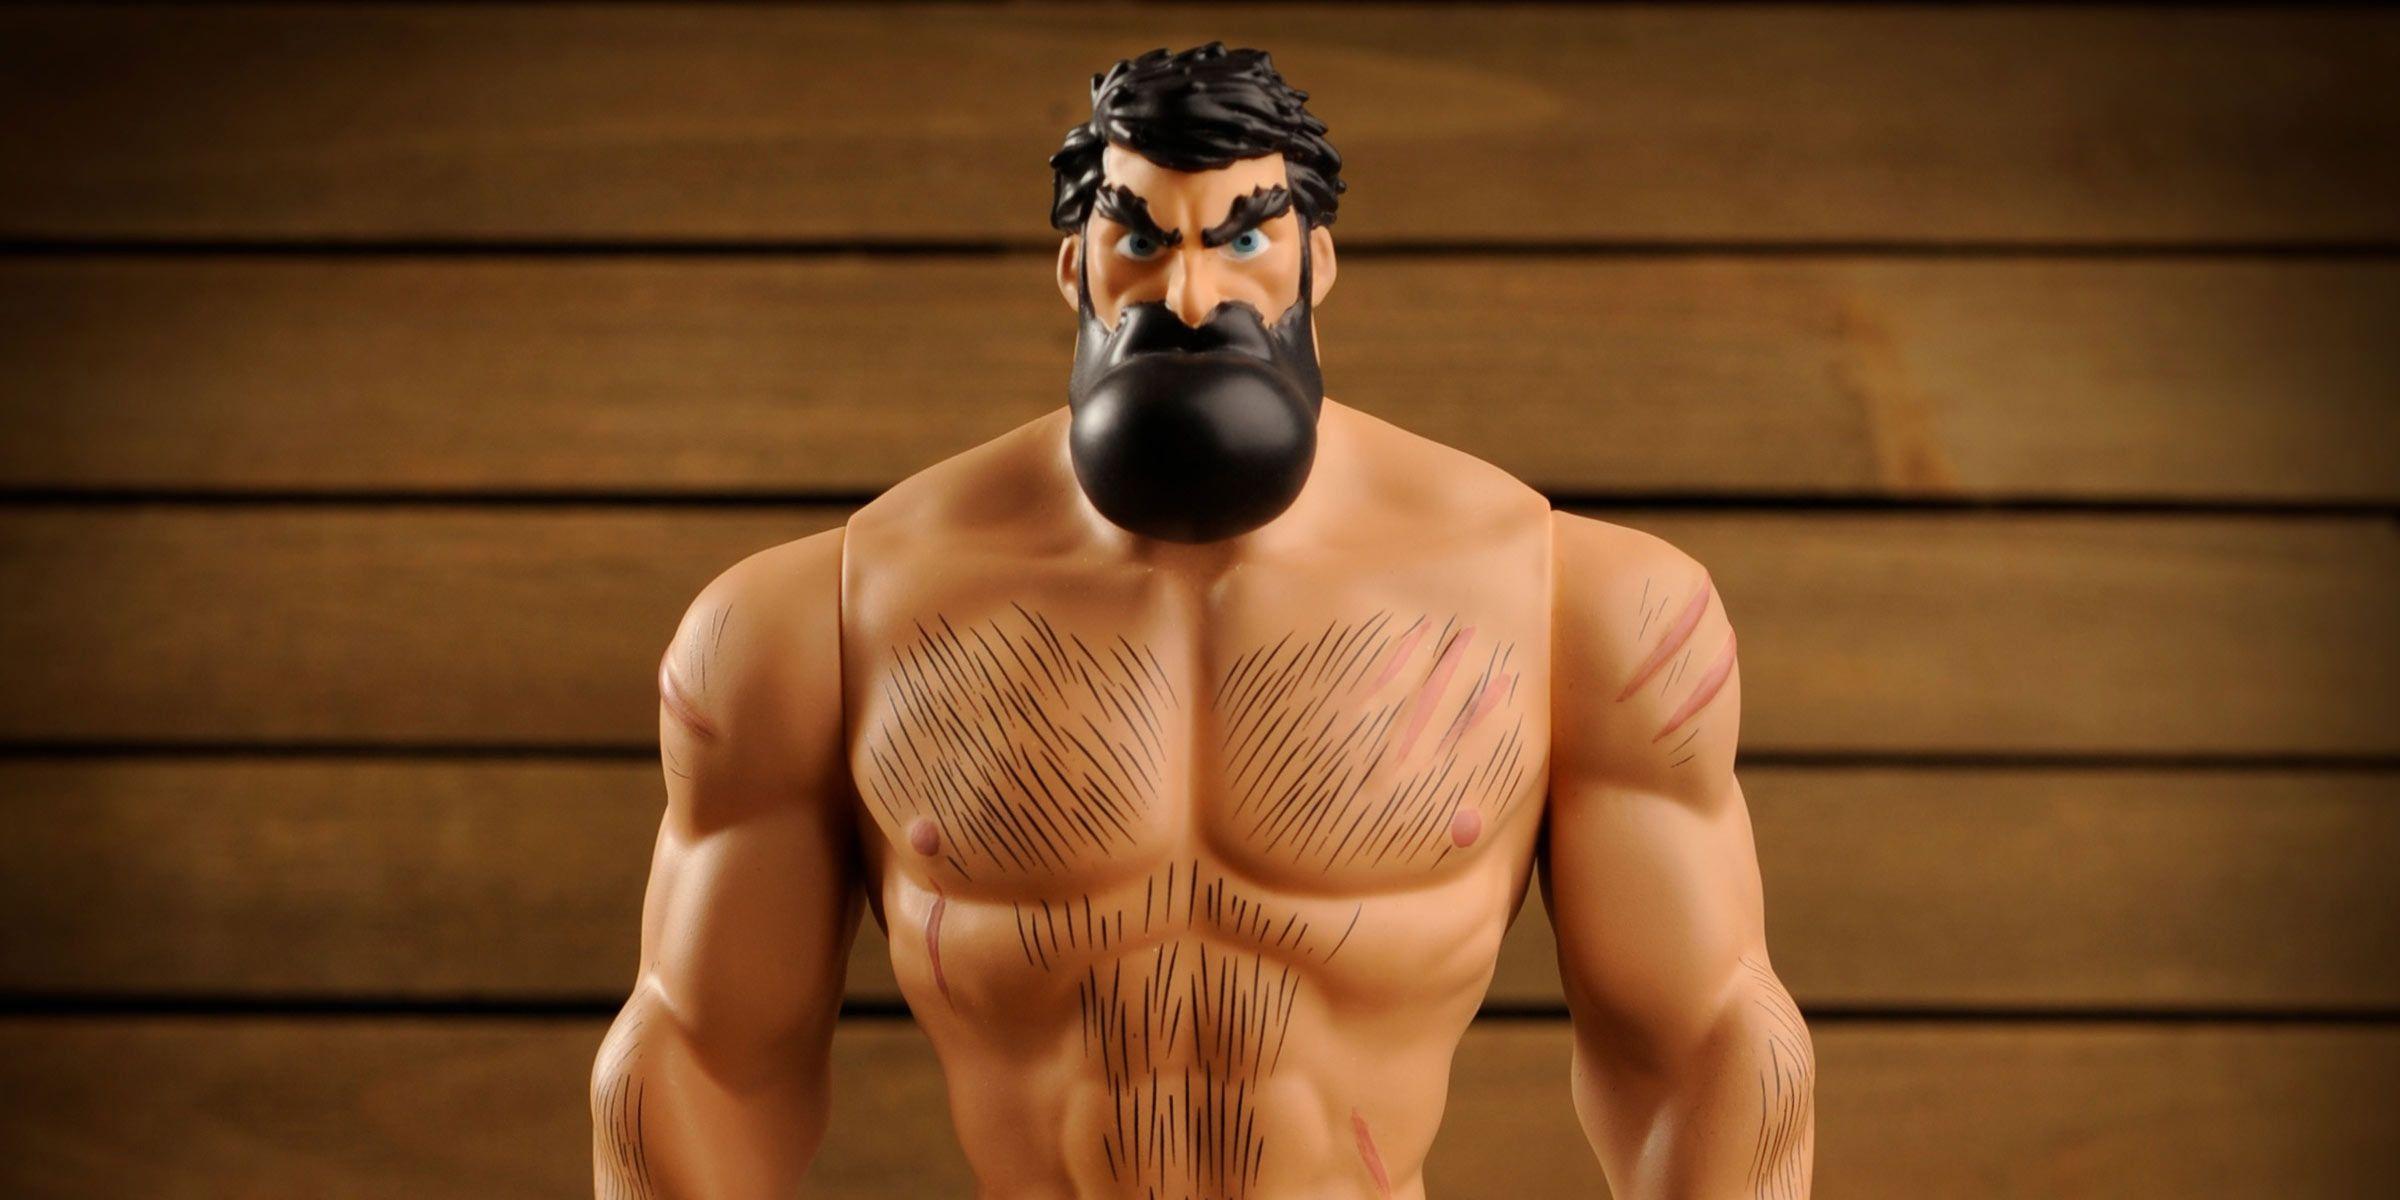 Image S Shirtless Bear Fighter Gets Vinyl Figure Cbr